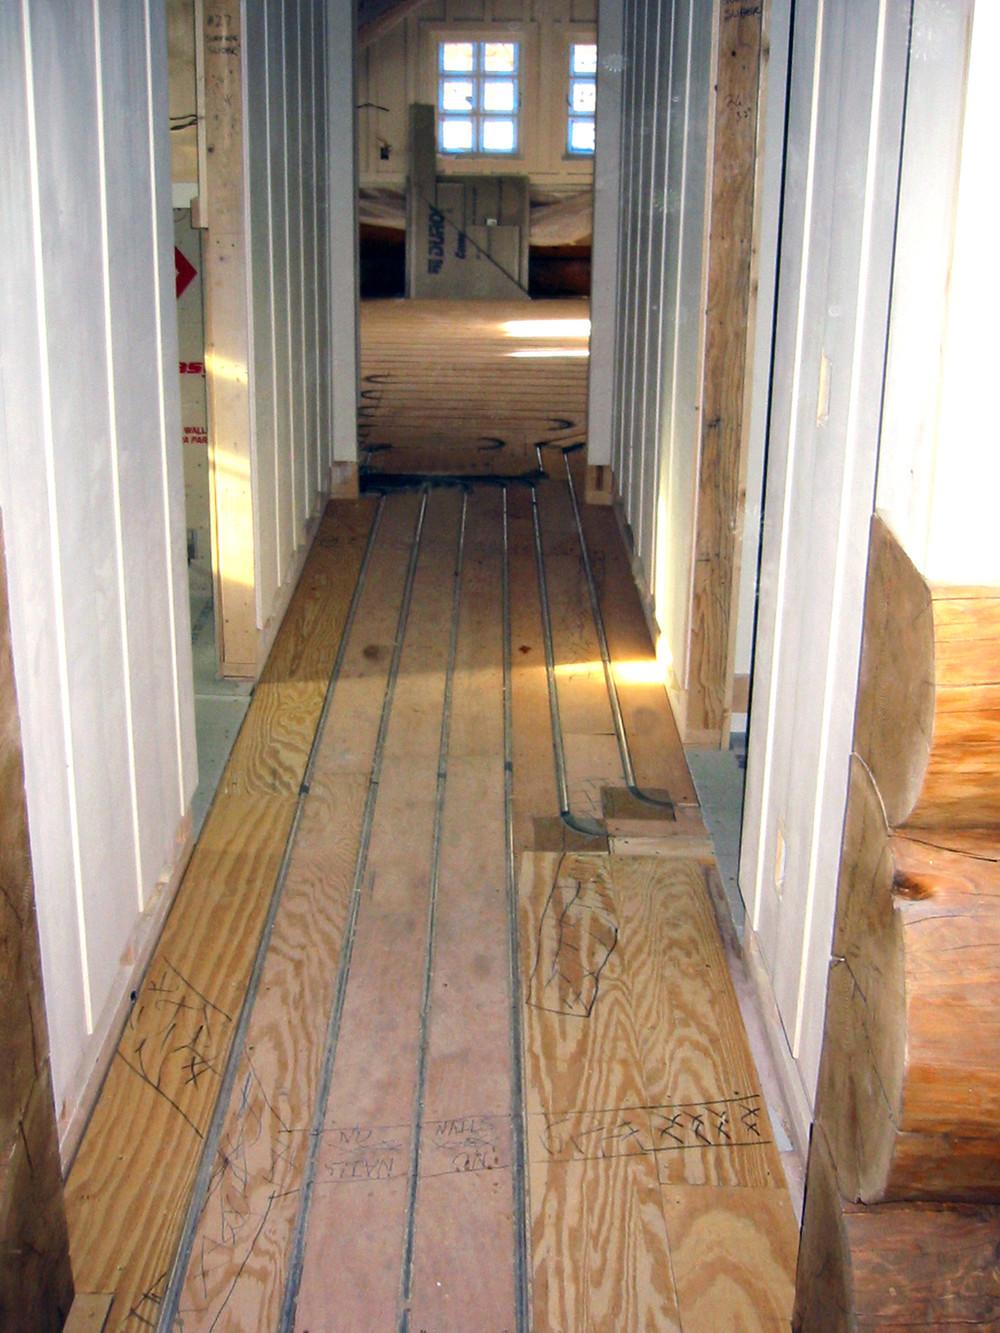 How Do You Install Hardwood Floors On Concrete Of Tfinu Radiant Design Supply Inc with Regard to Log Hallway